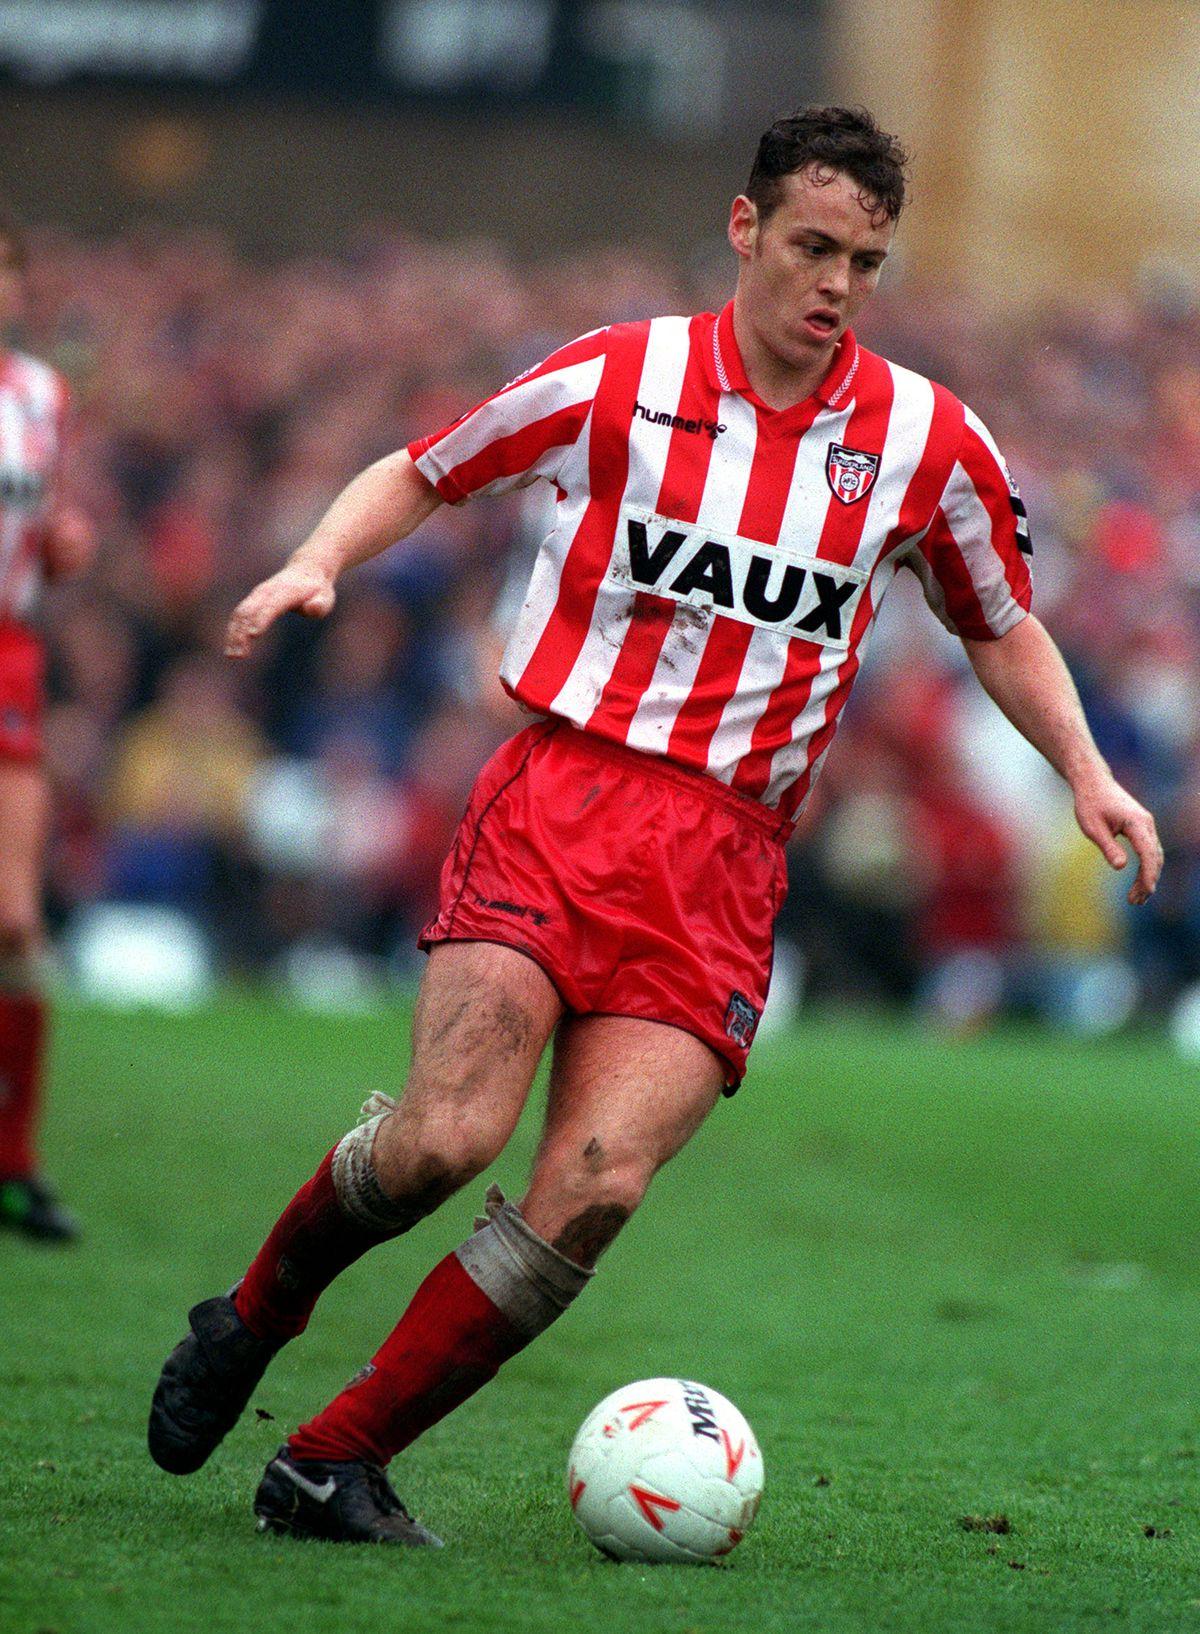 Sport. Football. League Division One. St James Park, England. 22nd April 1993. Newcastle United 1 v Sunderland 0. Sunderland's Gordon Armstrong.